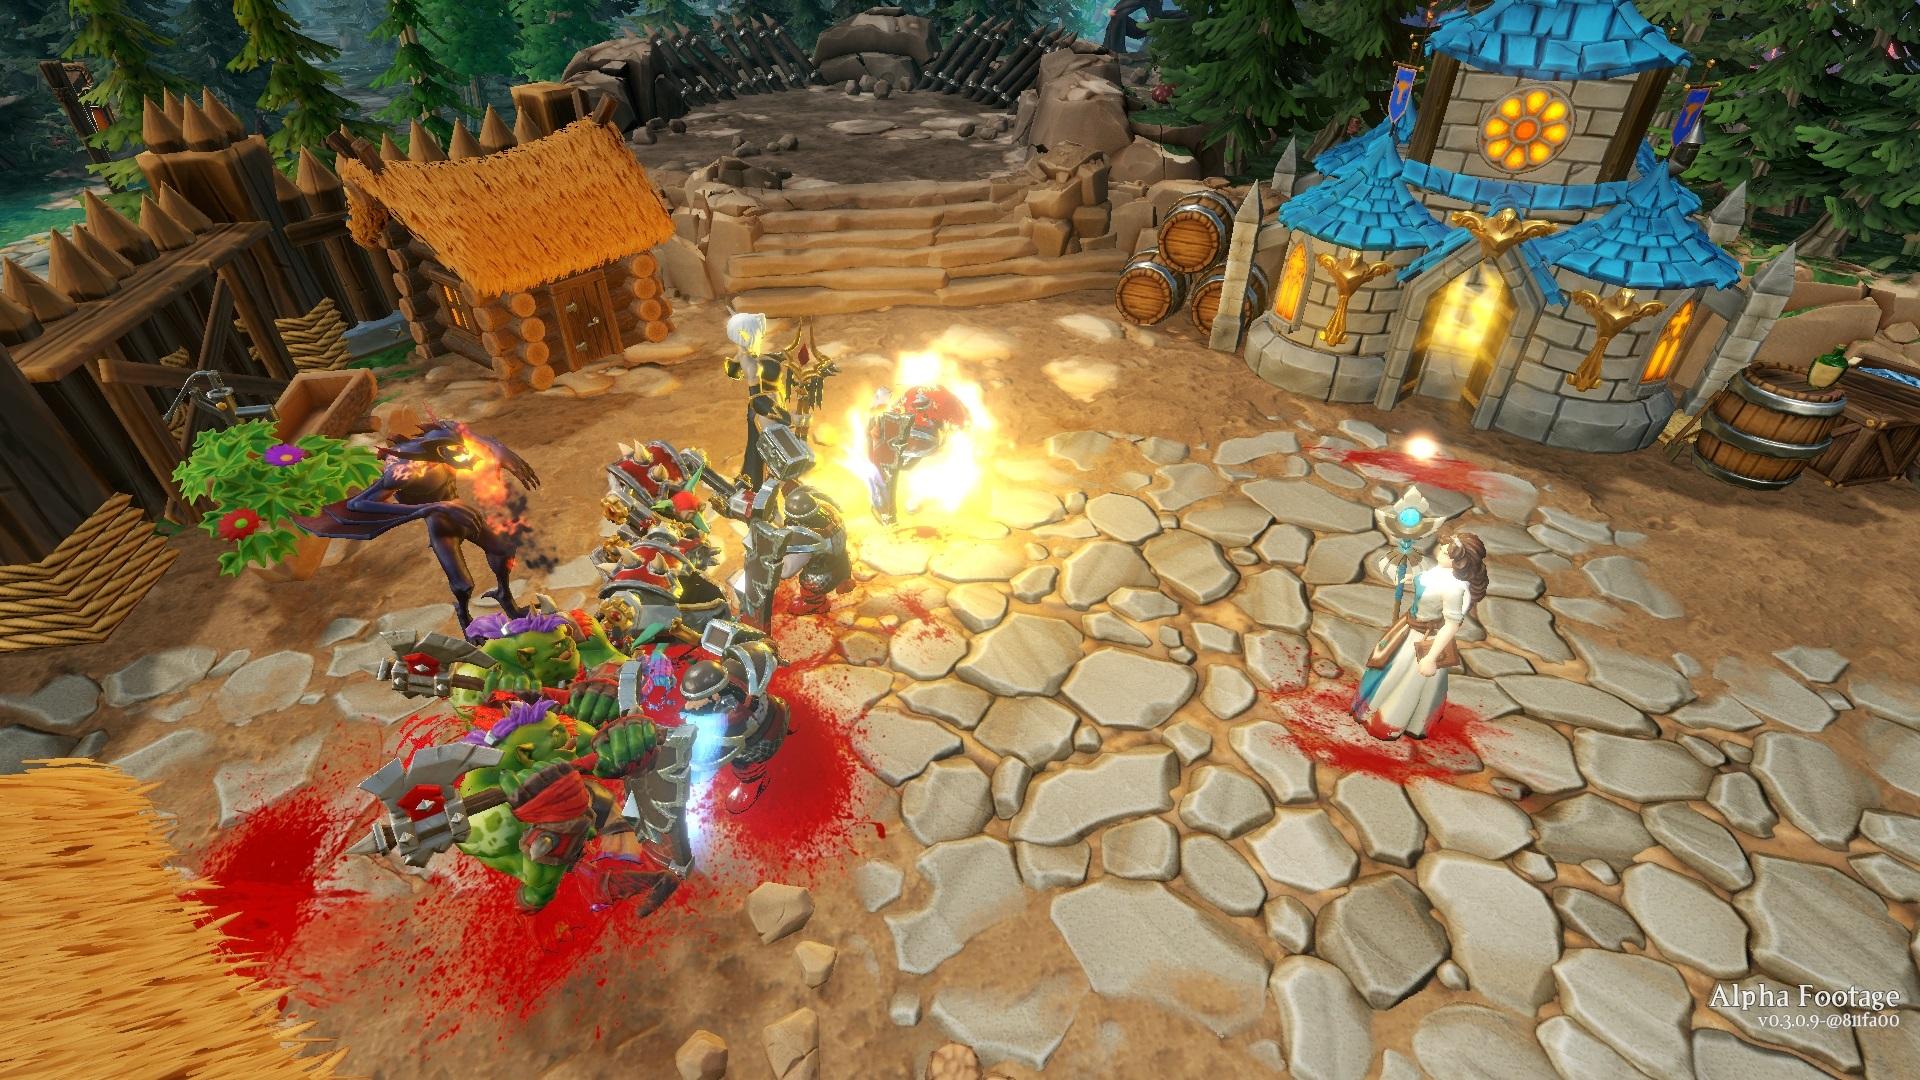 dungeons-3-02-21-17-6.jpg